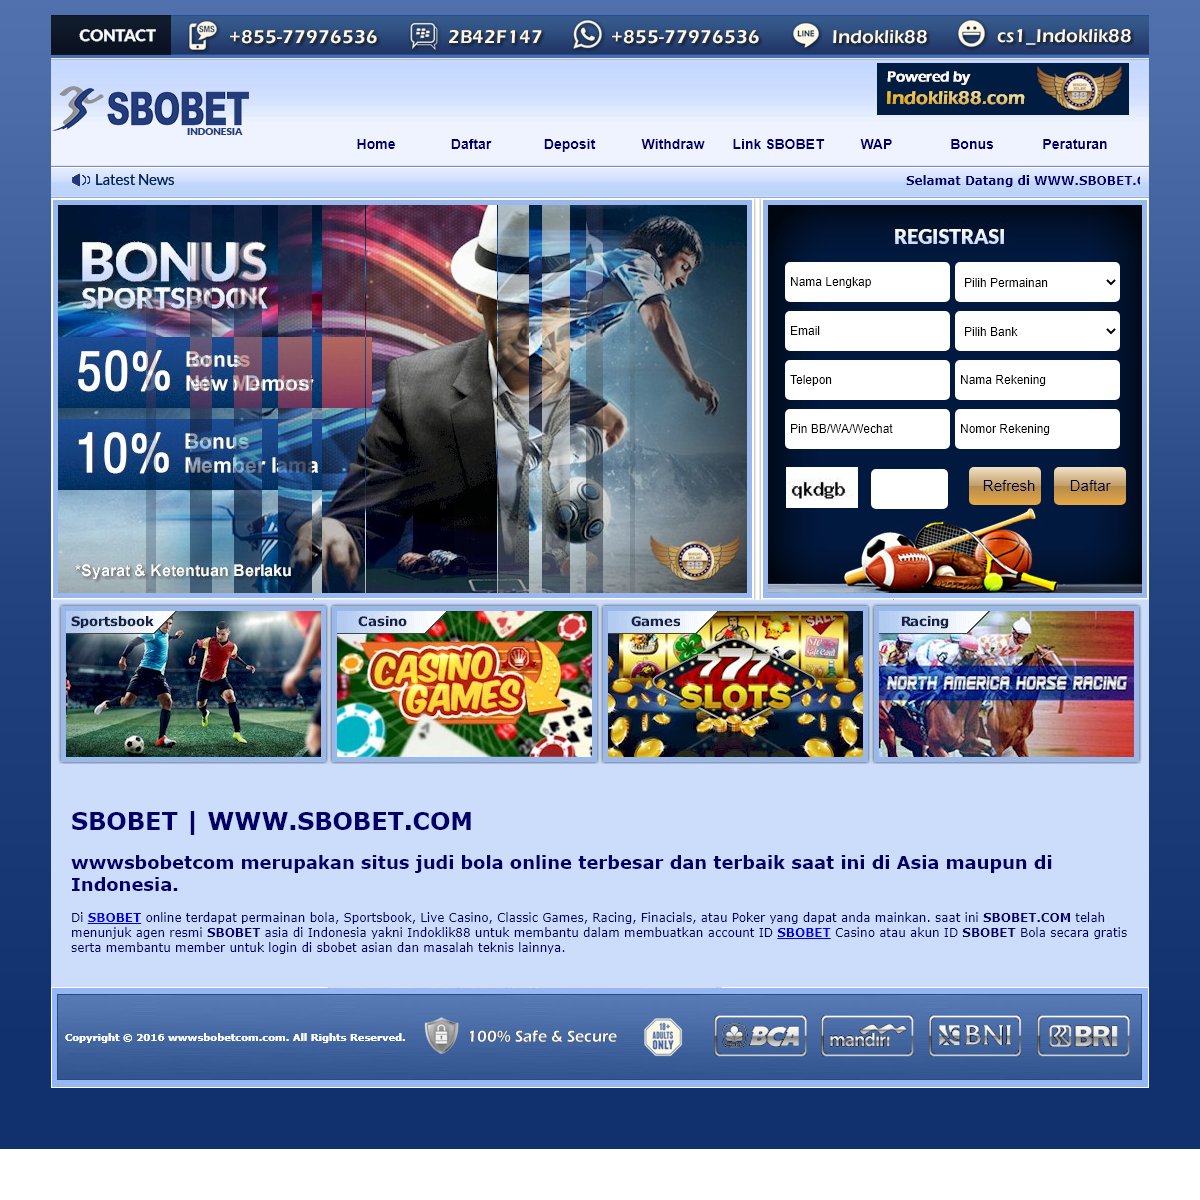 SBOBET - wwwsbobetcom - www.sbobet.com